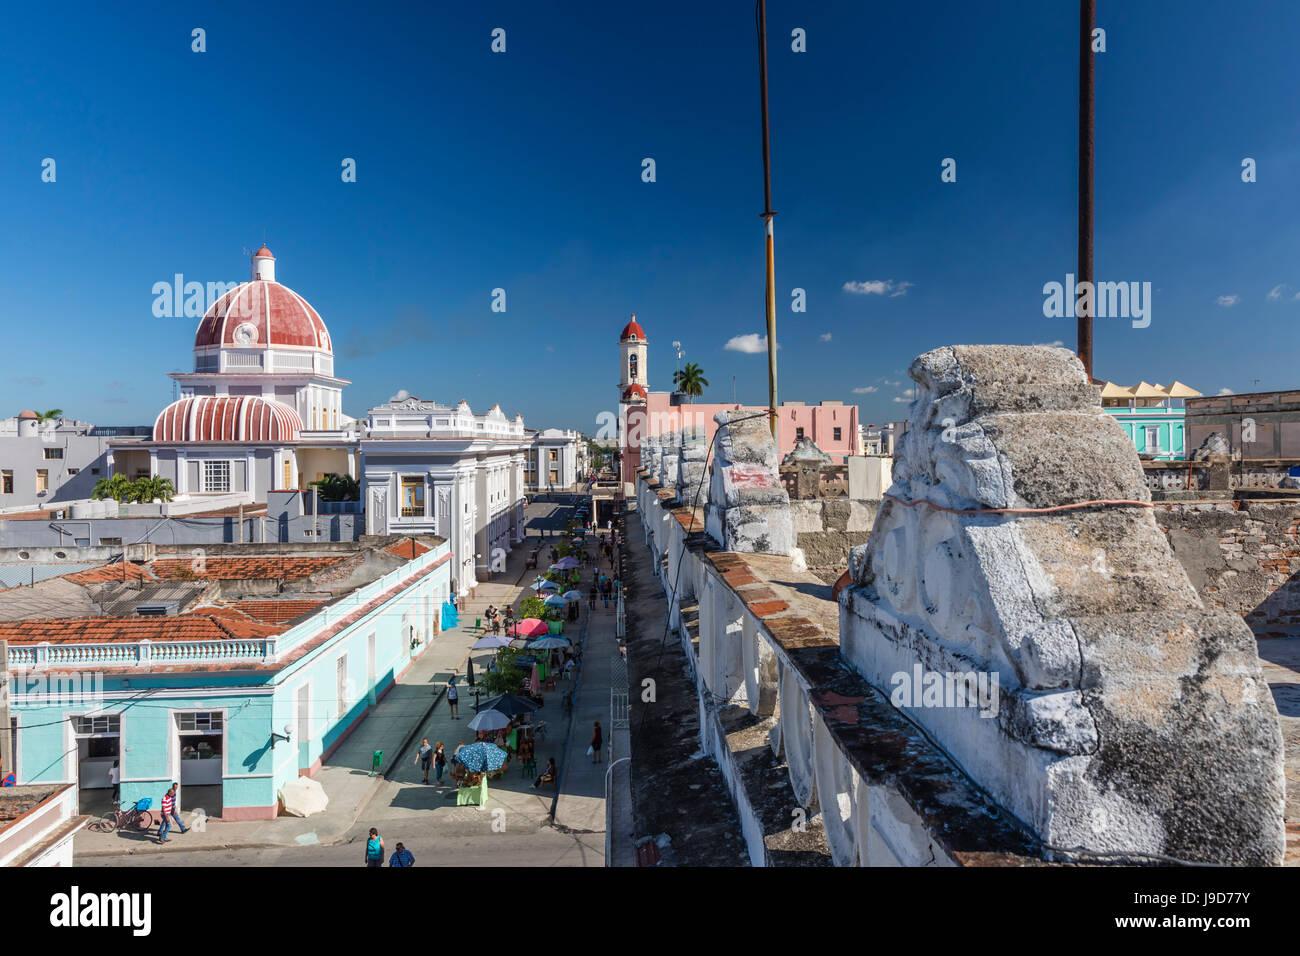 Antiguo Ayuntamiento, accueil de l'immeuble du gouvernement provincial, l'UNESCO, Cienfuegos, Cuba, Antilles, Photo Stock